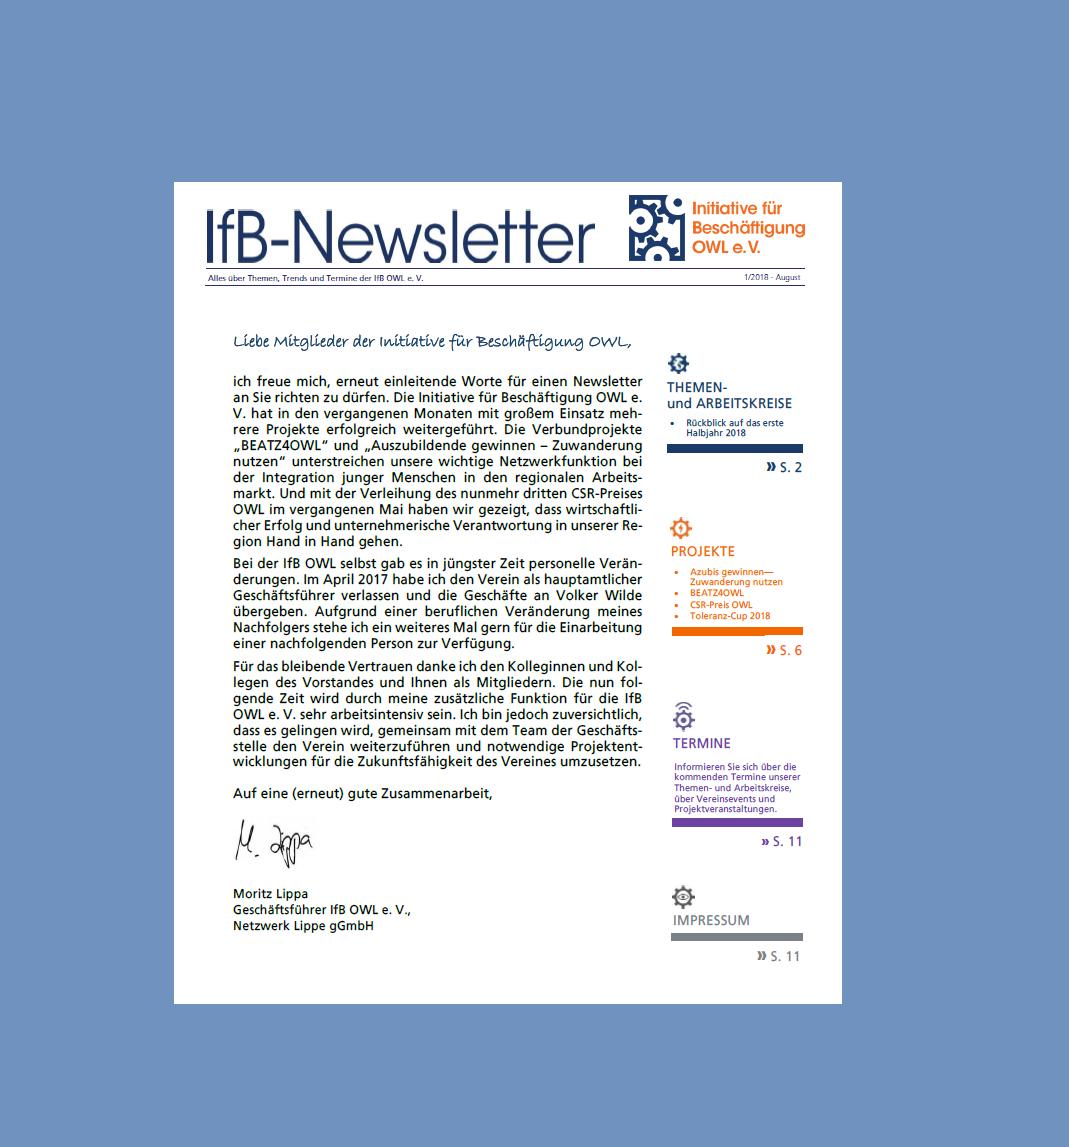 IfB-Newsletter 08-18